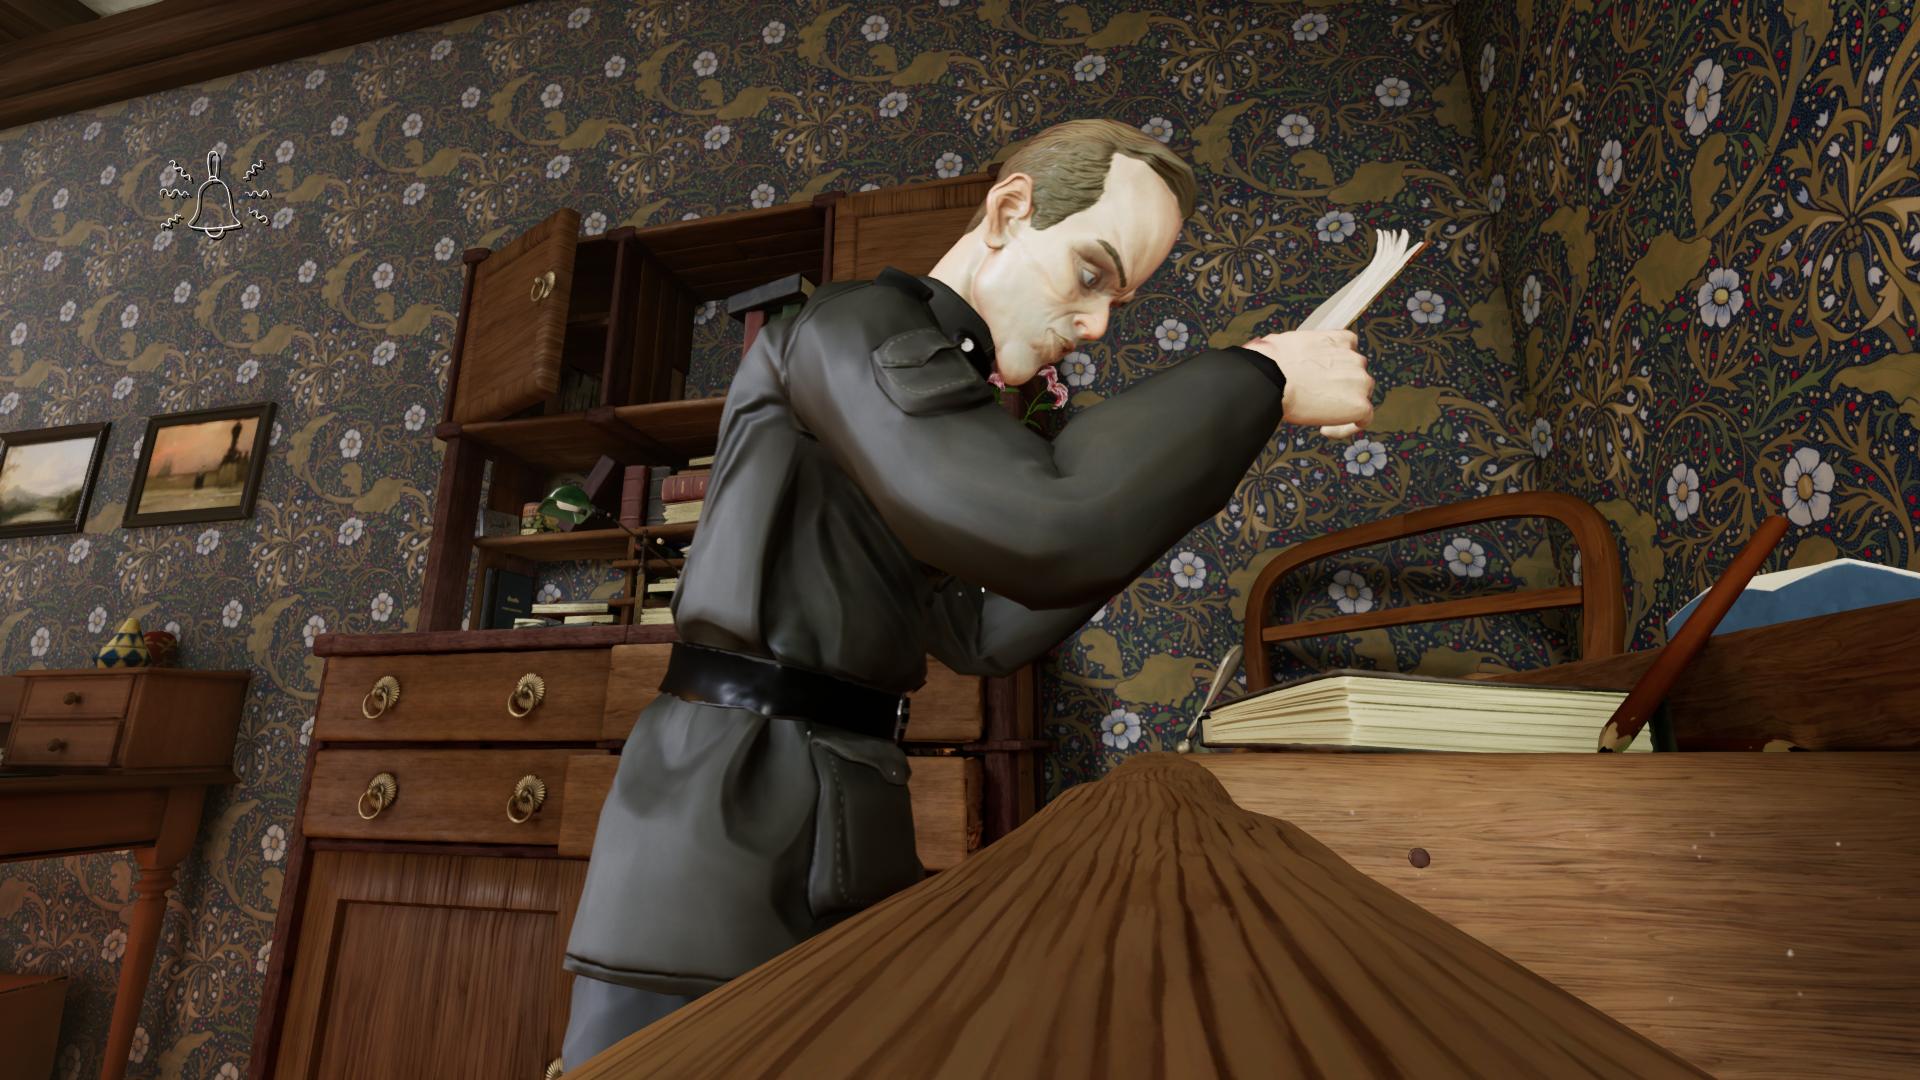 Metamorphosis game screenshot - authorities visit Josef